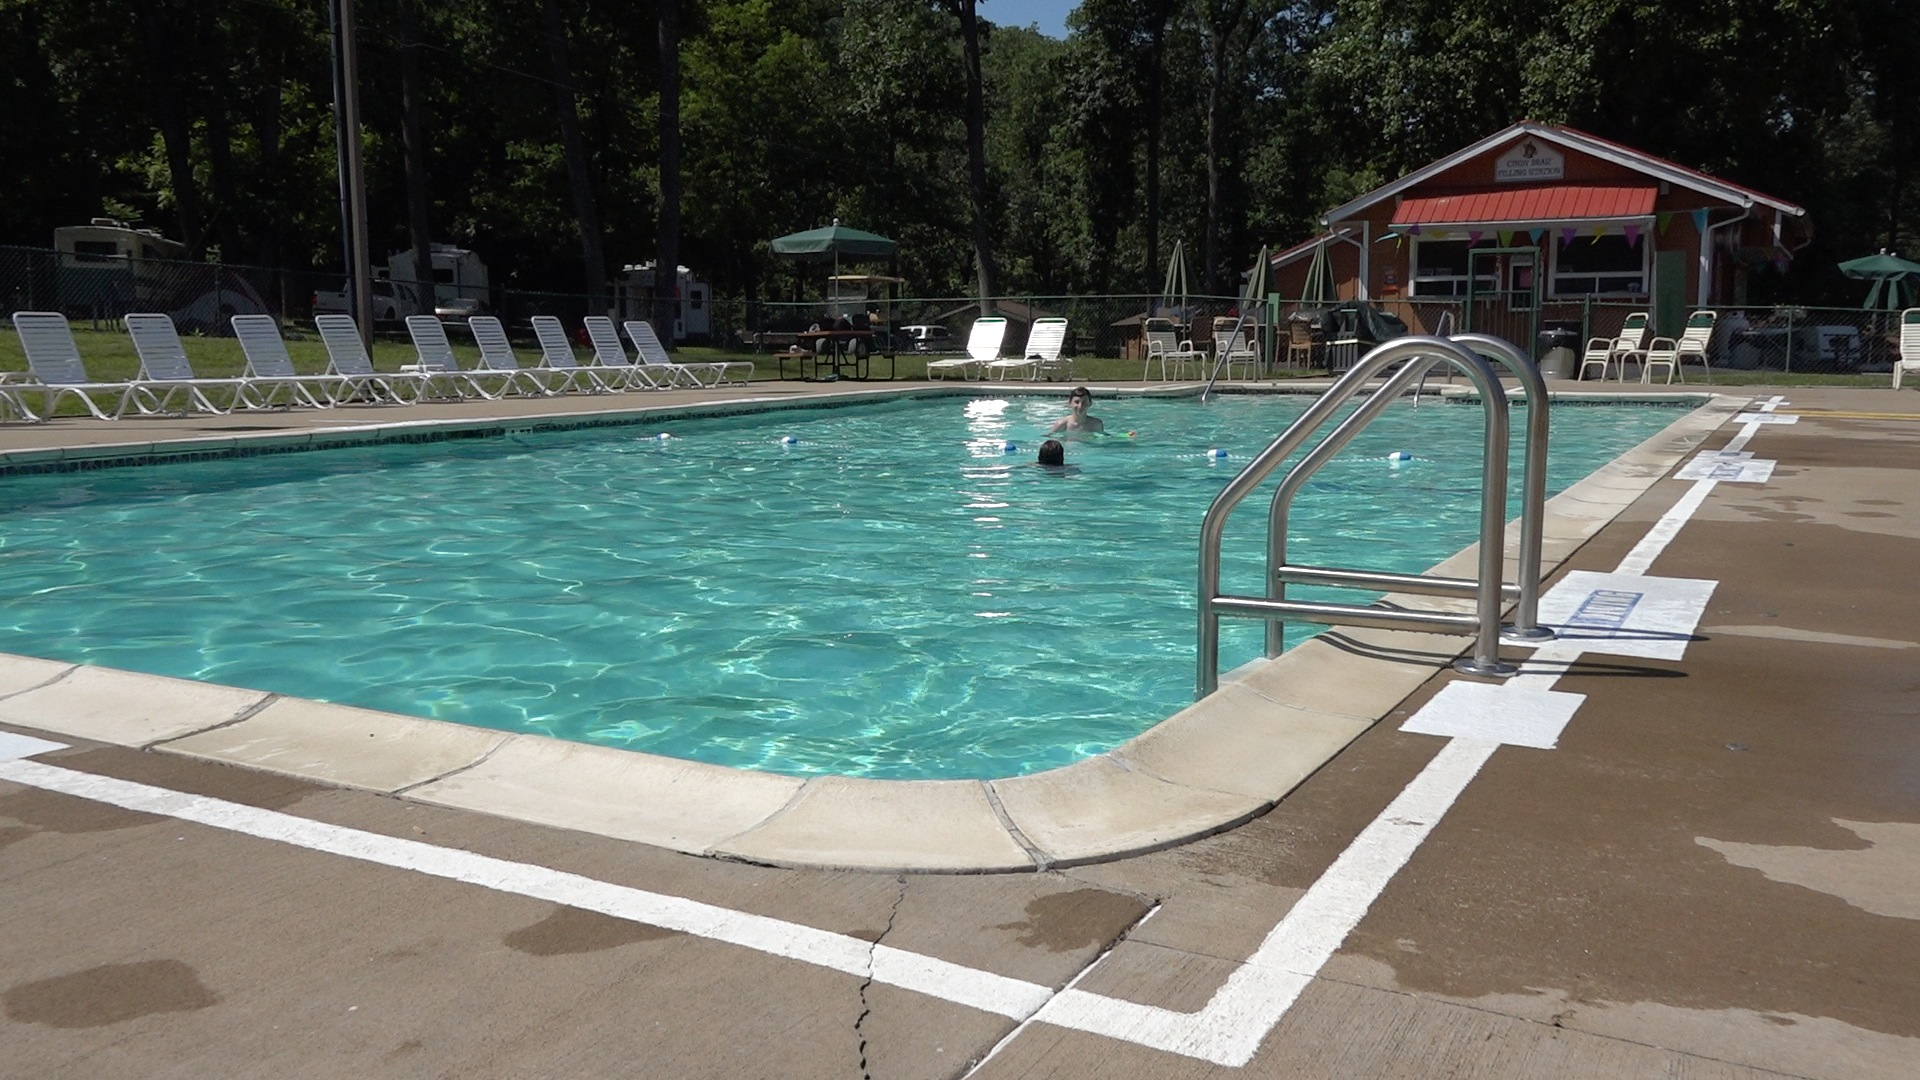 swimming poolsprivate pennsylvania lewisburg